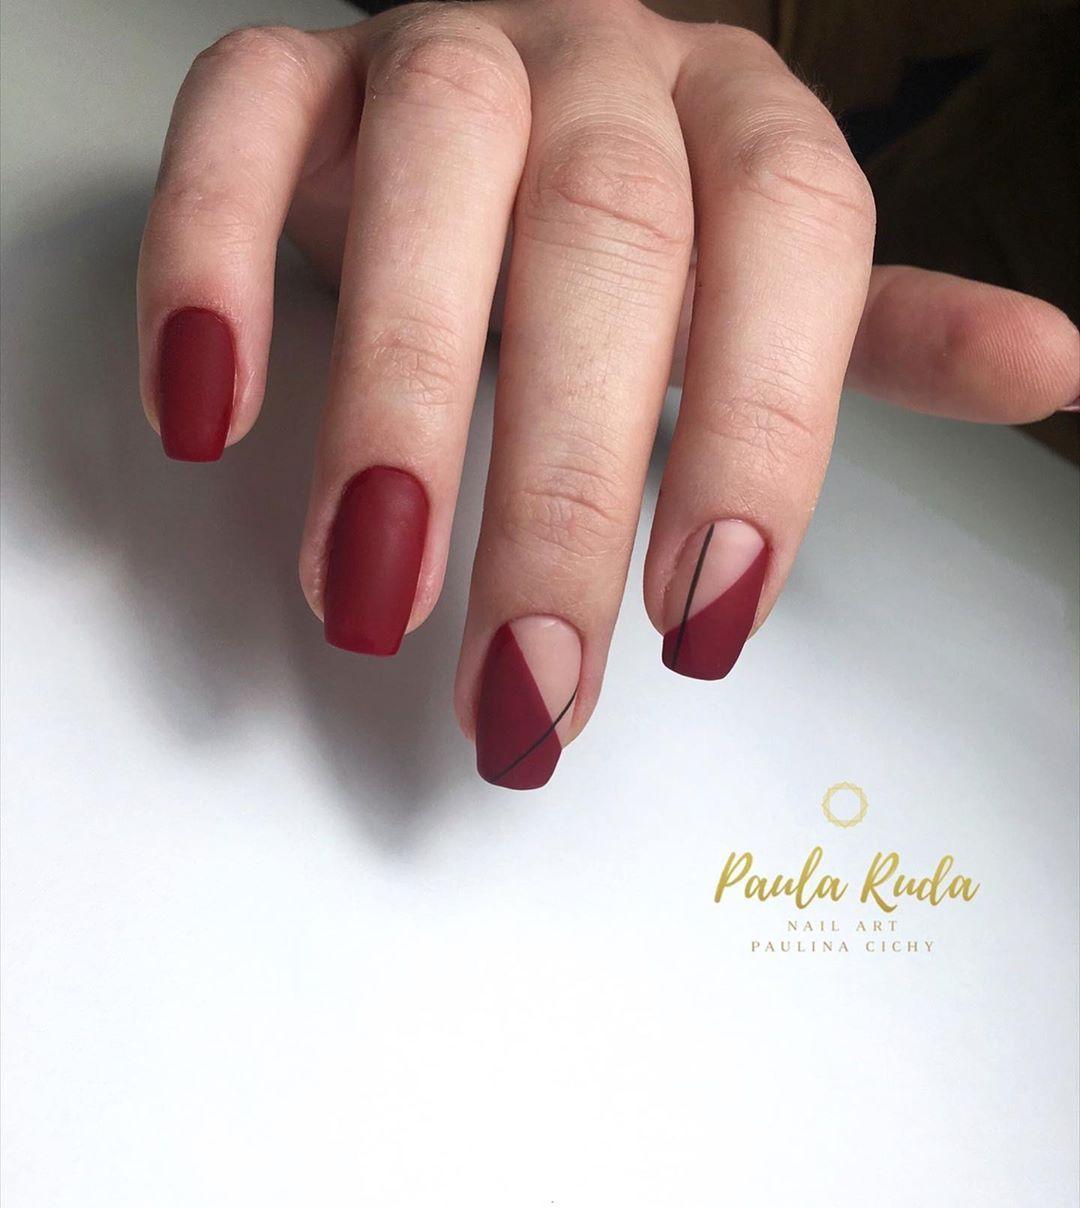 Nails Paulina Cichy